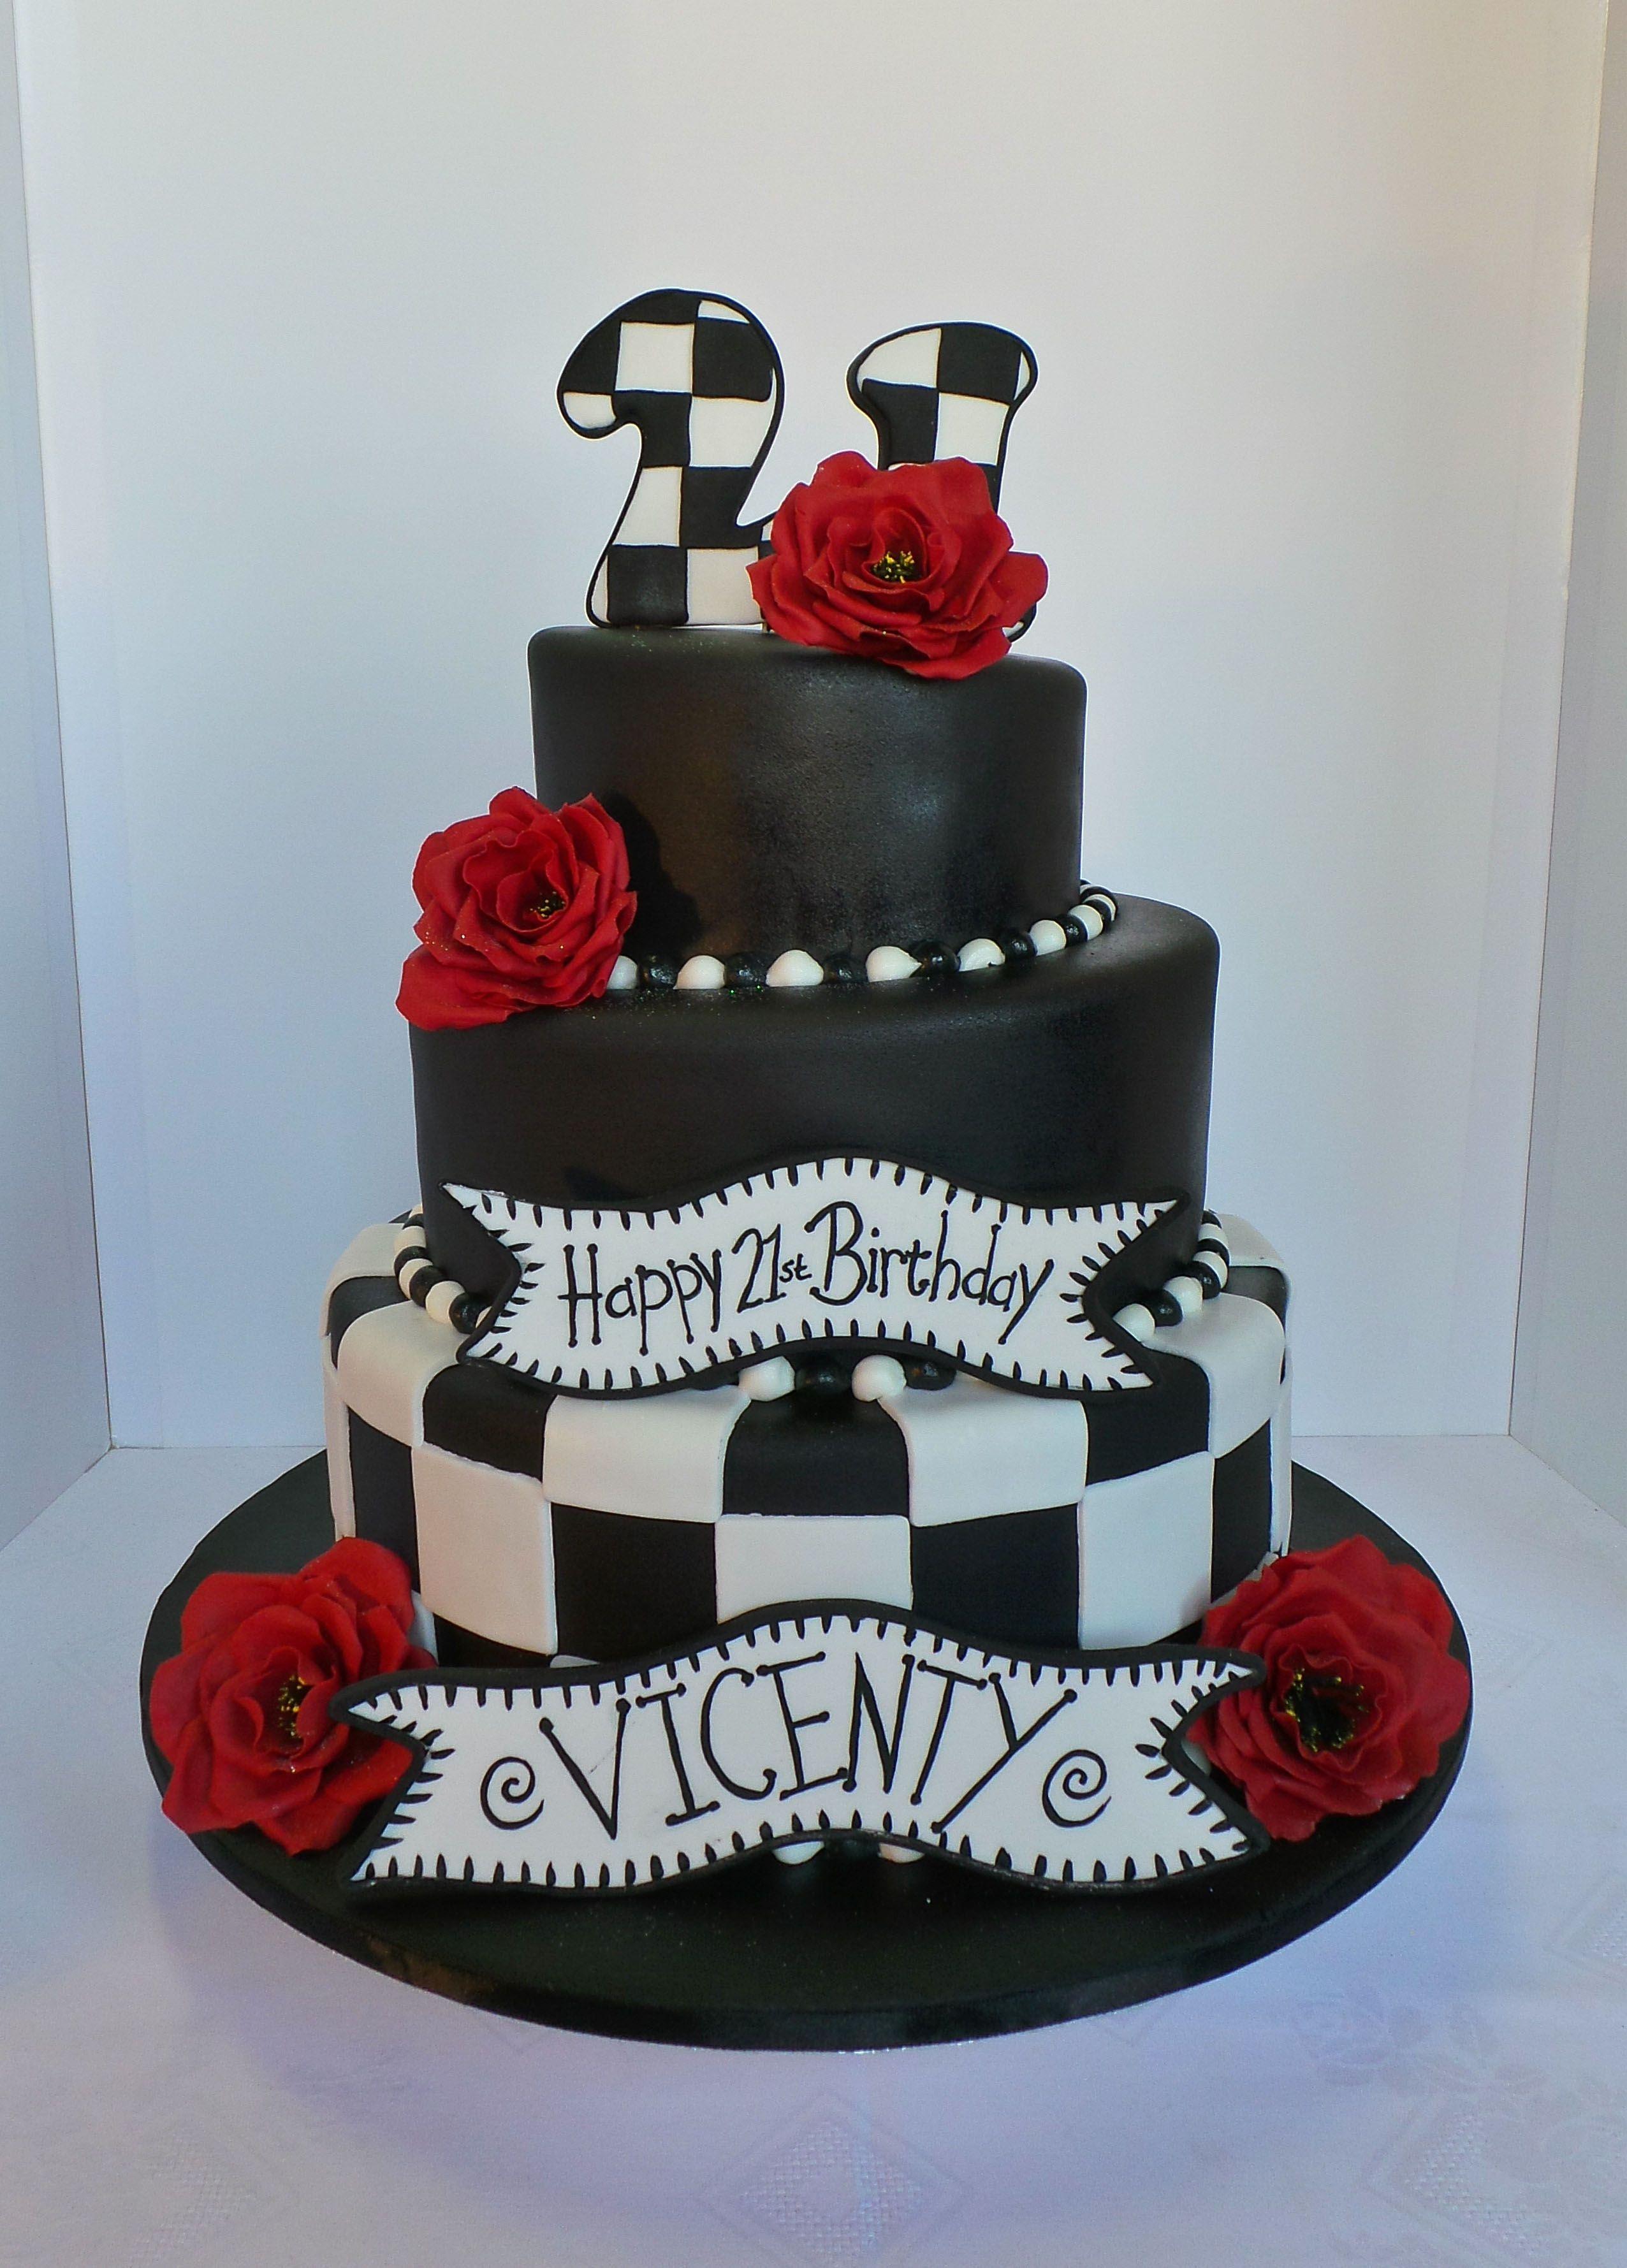 21st Black and White Birthday Cake. Cakefoto was brought